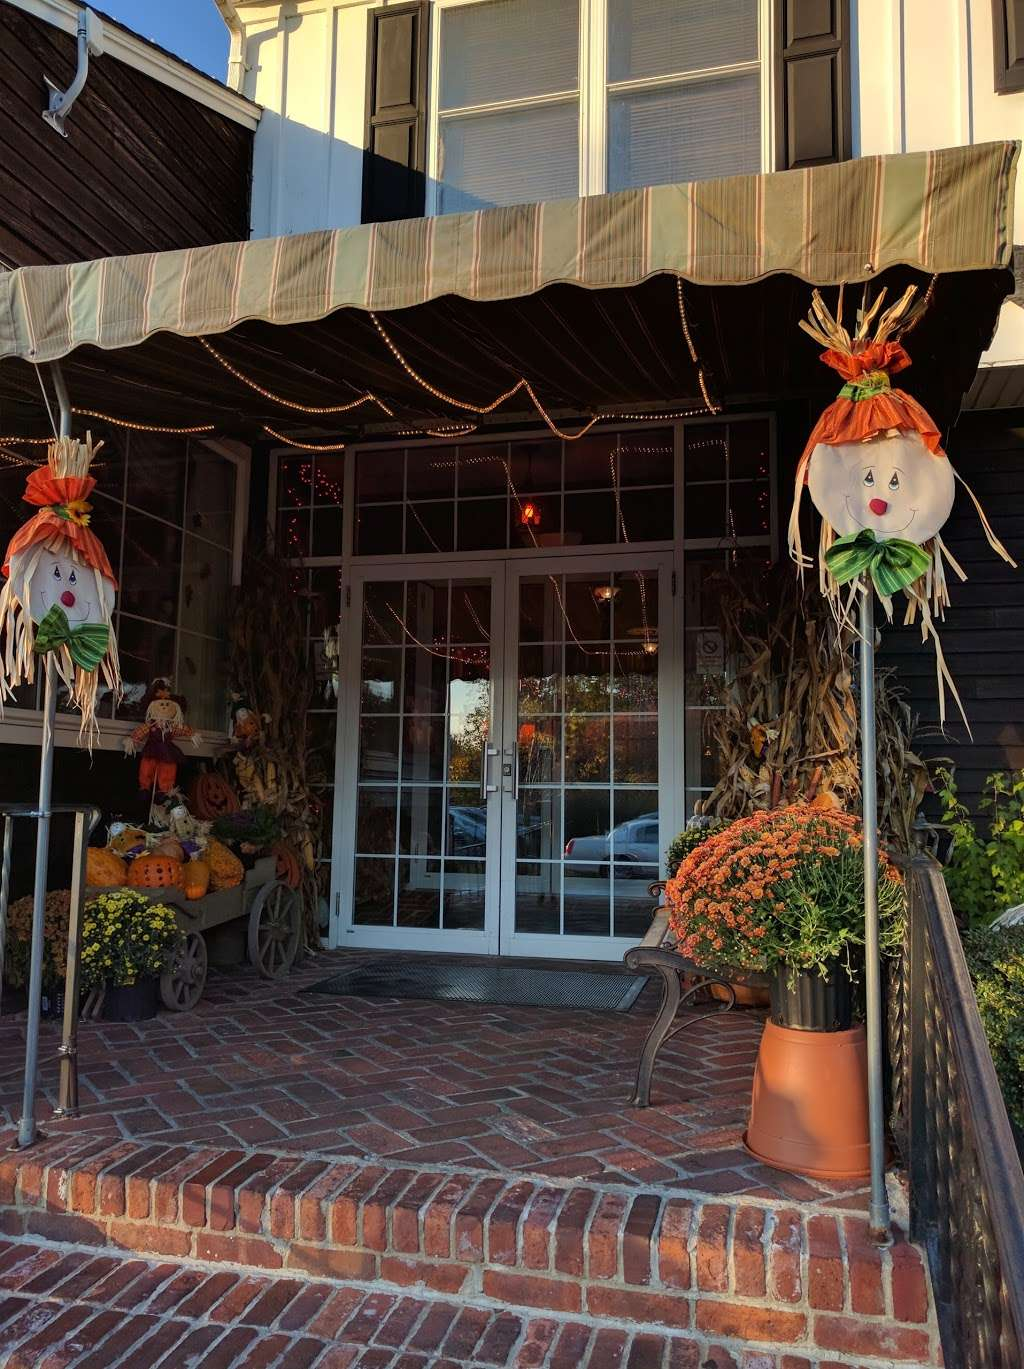 Tuckahoe Inn - cafe    Photo 3 of 10   Address: 1 Harbor Rd, Marmora, NJ 08223, USA   Phone: (609) 390-3322